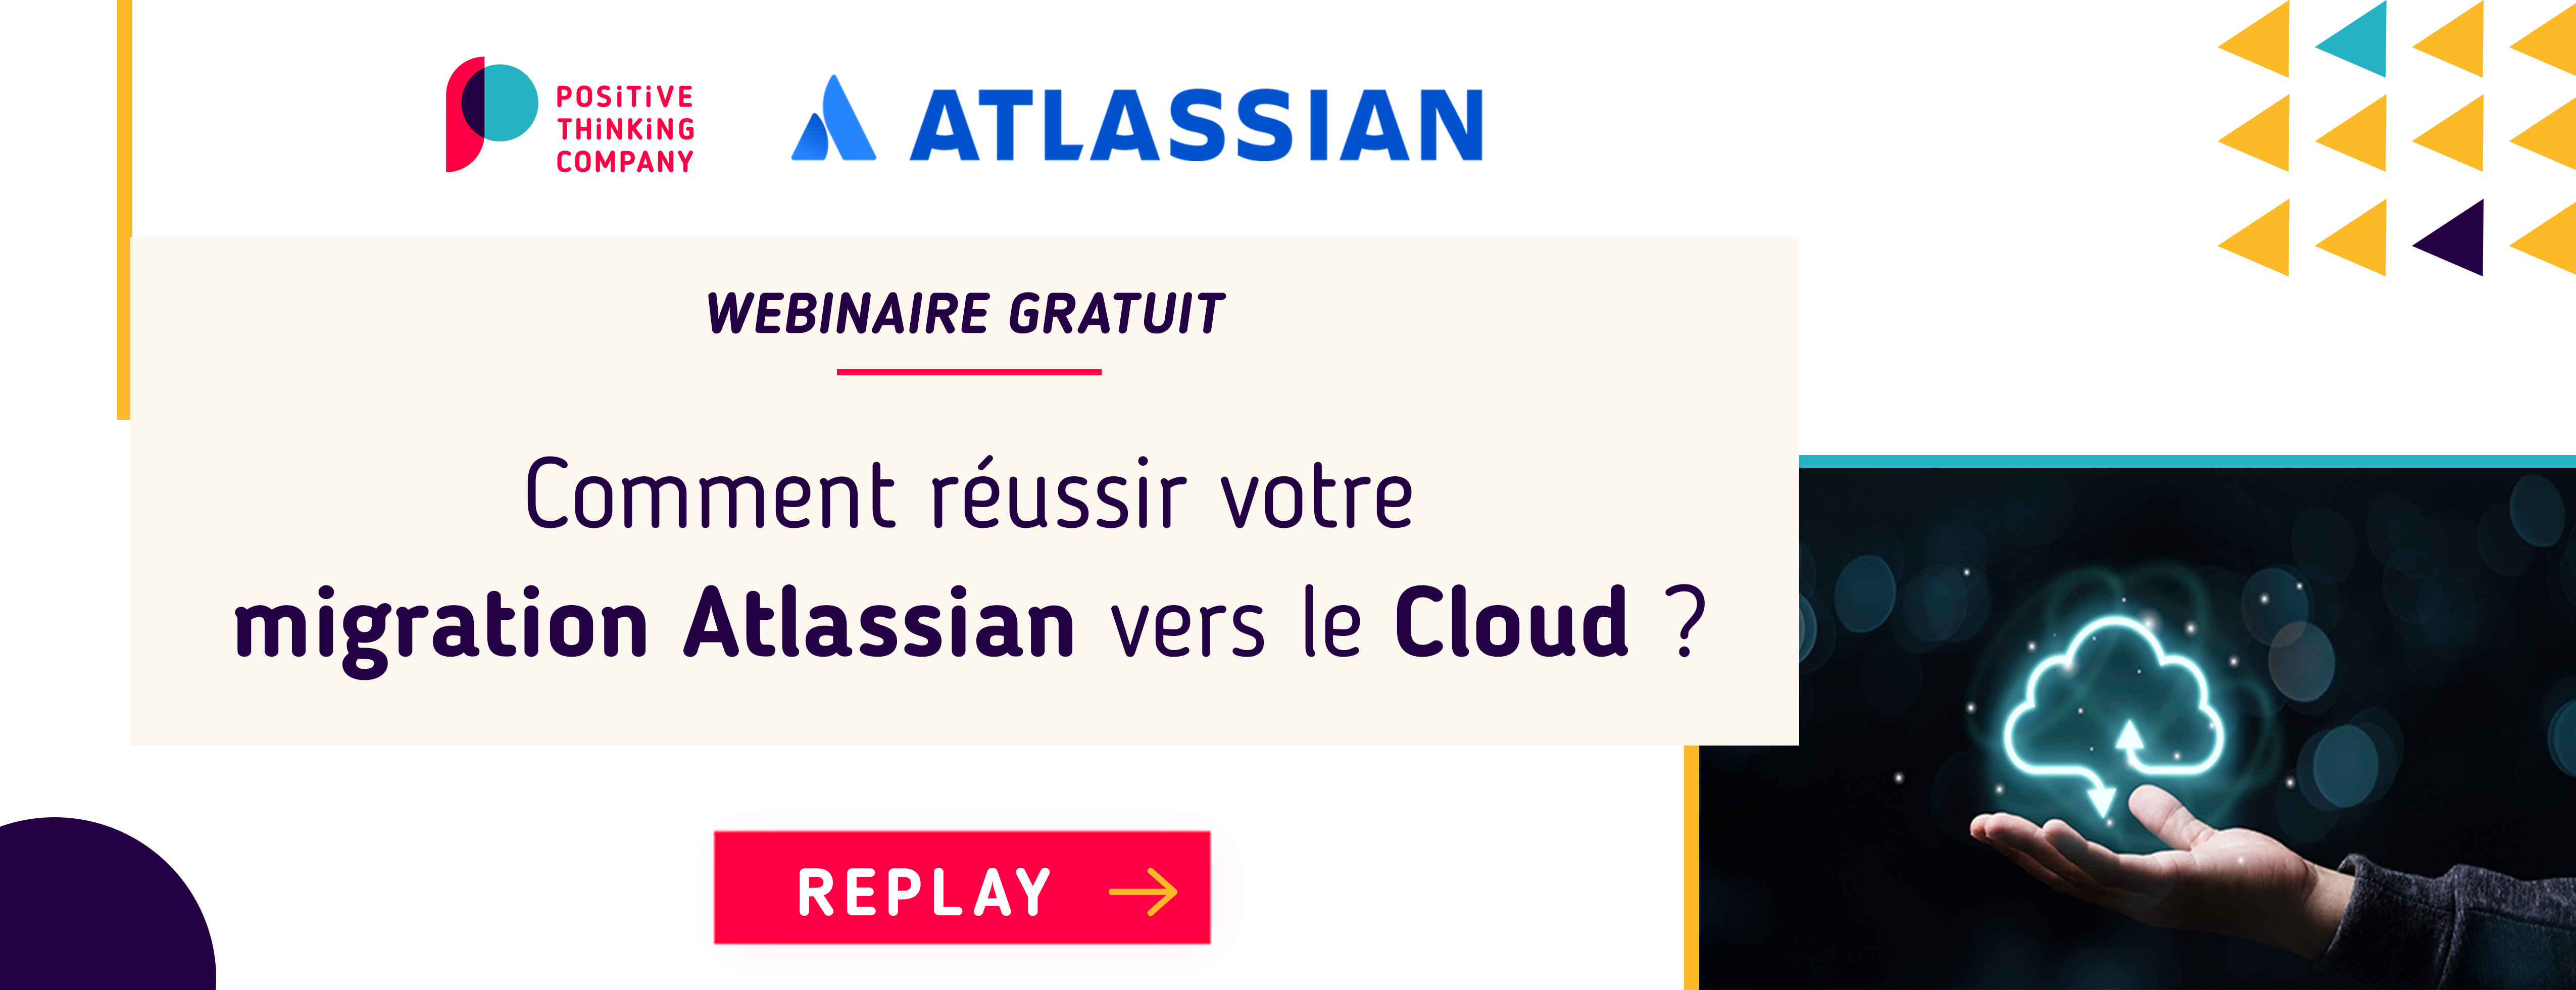 Replay Webinaire Atlassian